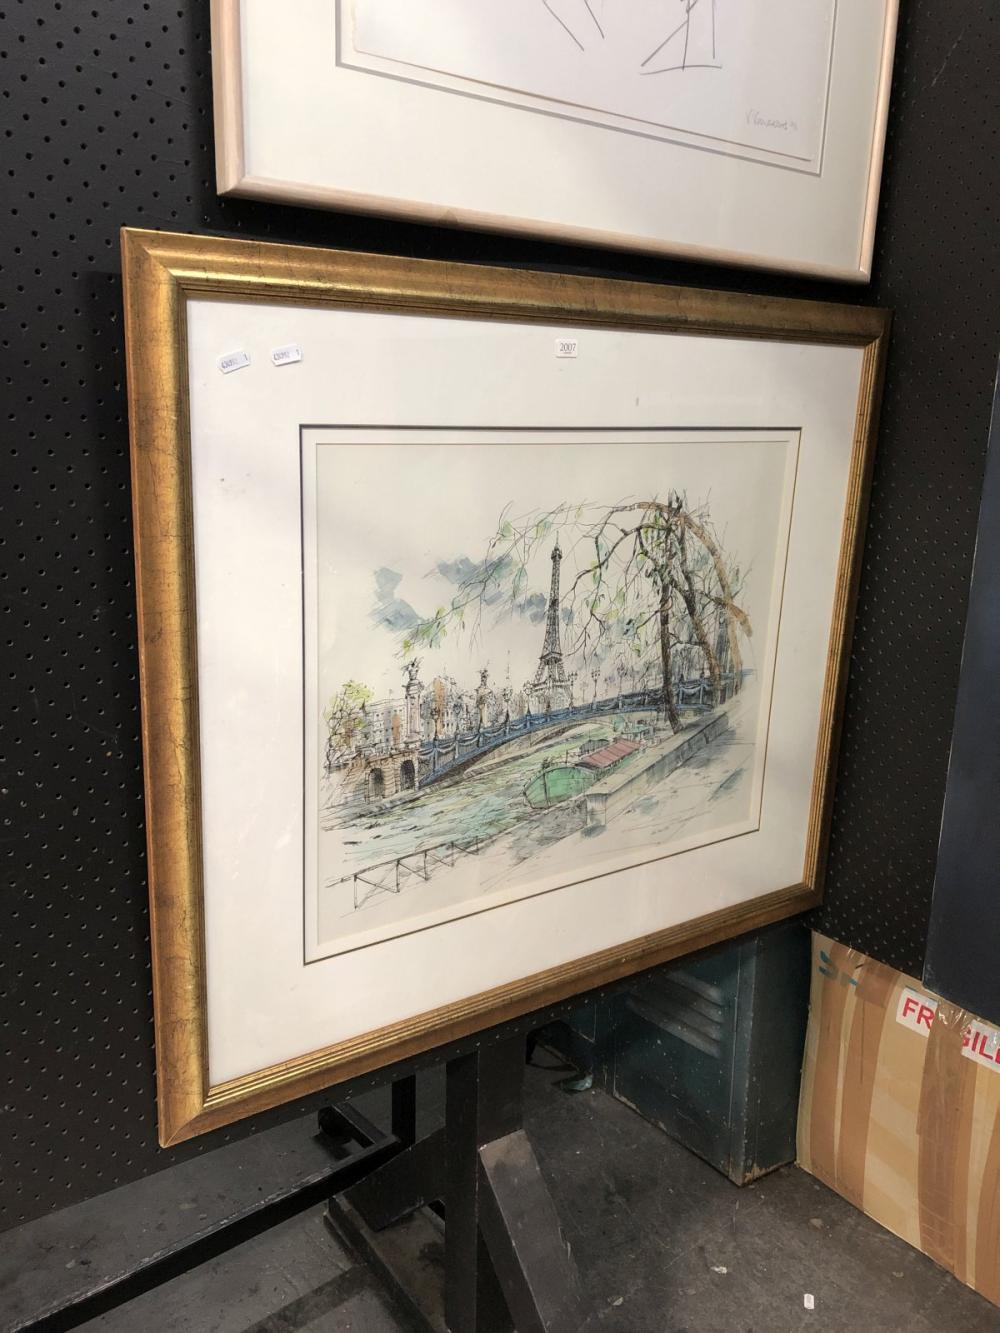 Artist Unknown - Paris Scene, pen & wash, SLR